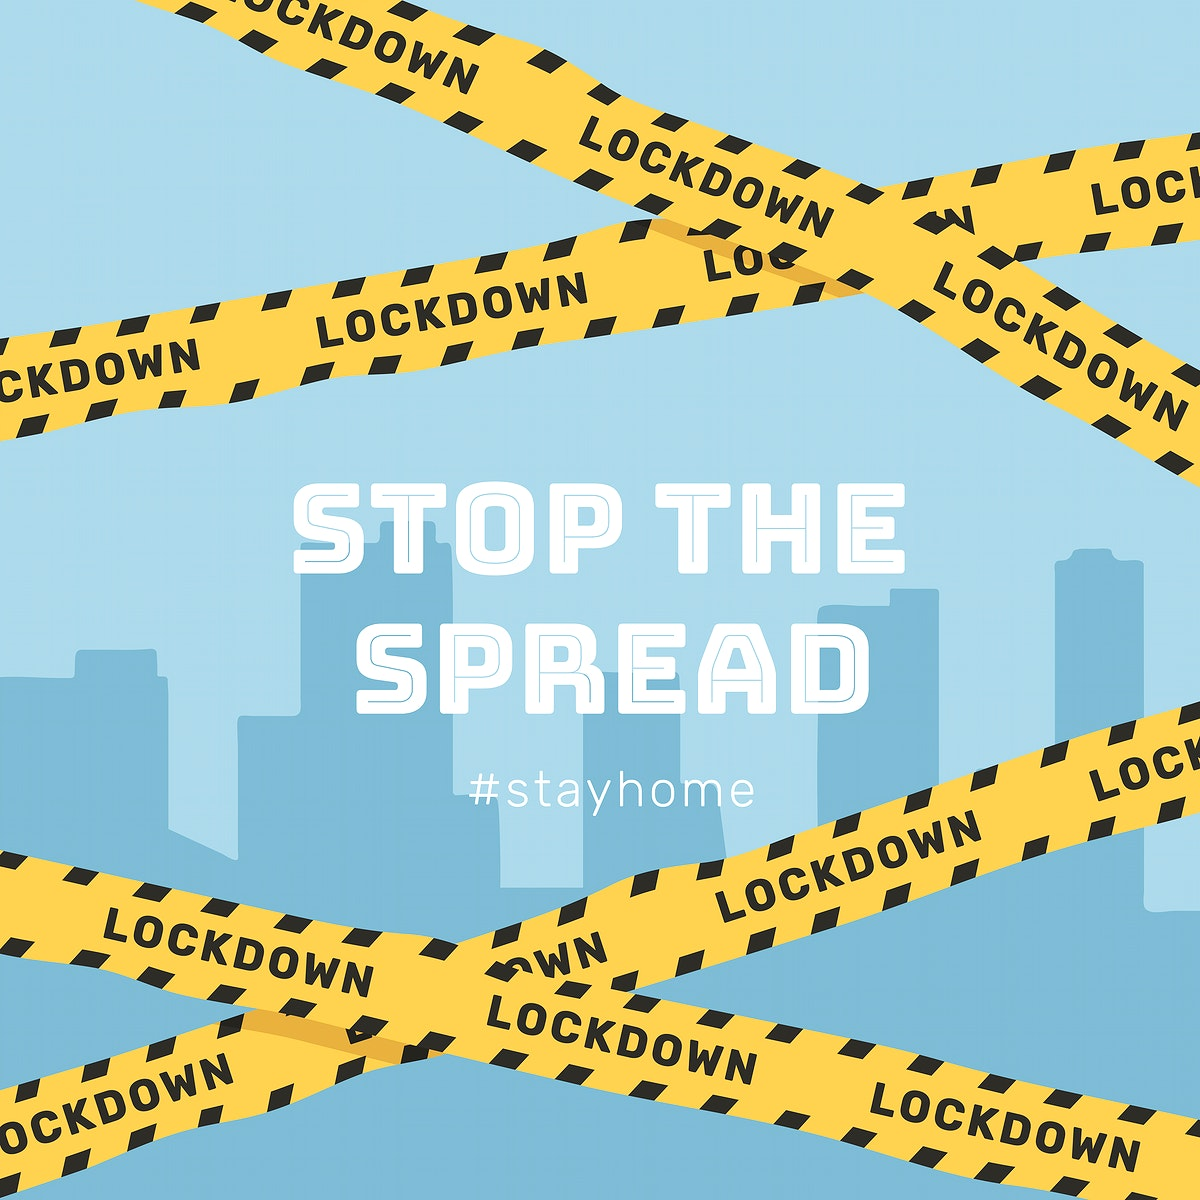 Stop the spread of Coronavirus template vector